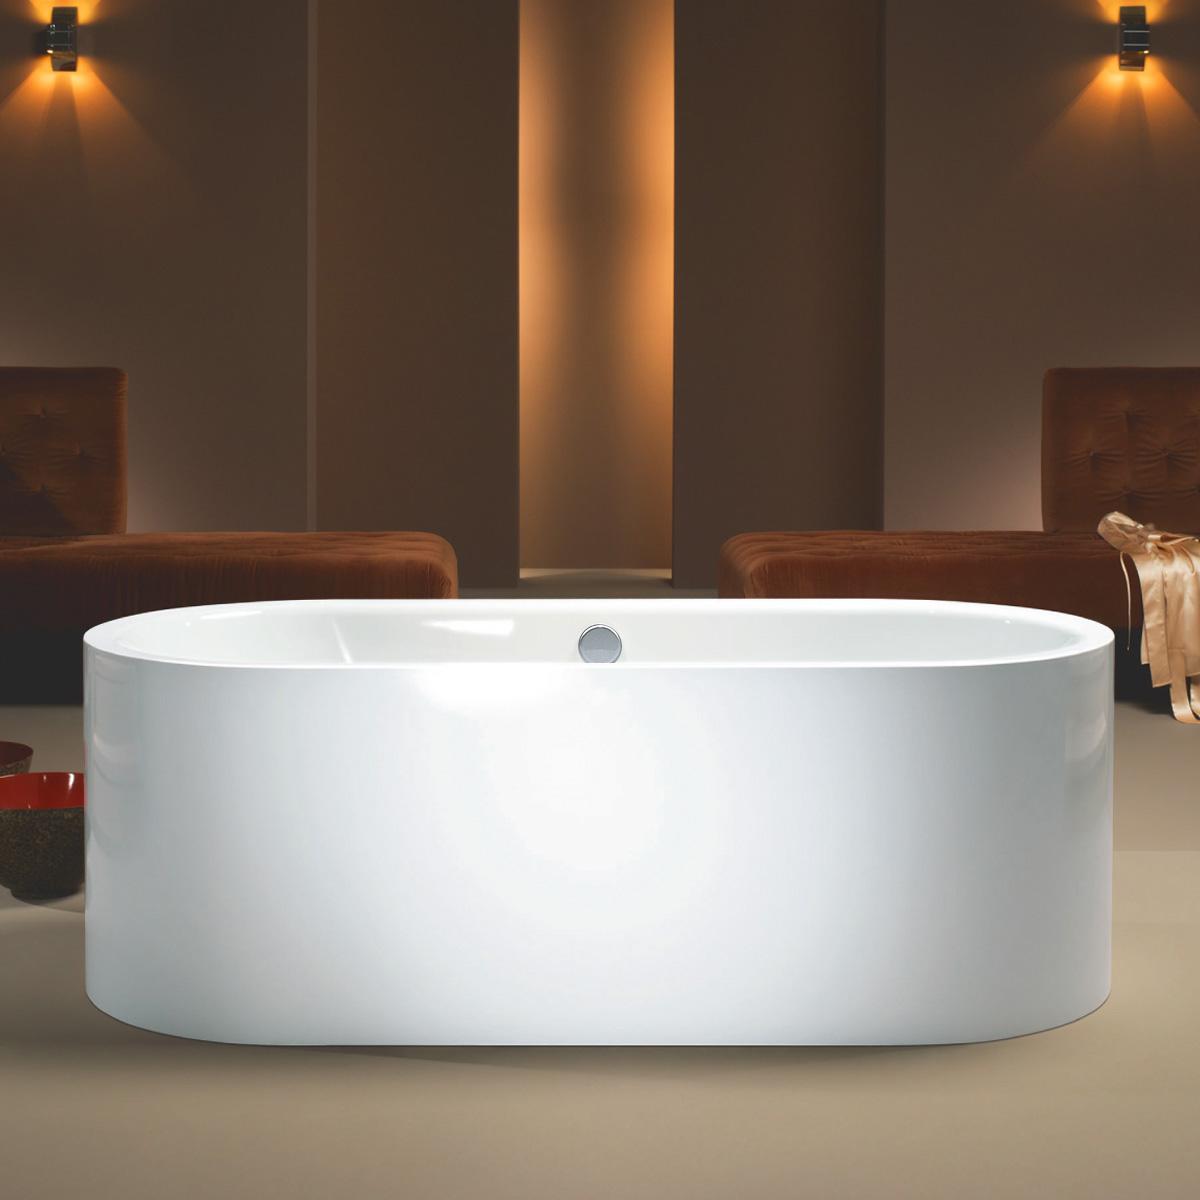 kaldewei meisterst ck centro duo oval 1128 freistehende. Black Bedroom Furniture Sets. Home Design Ideas